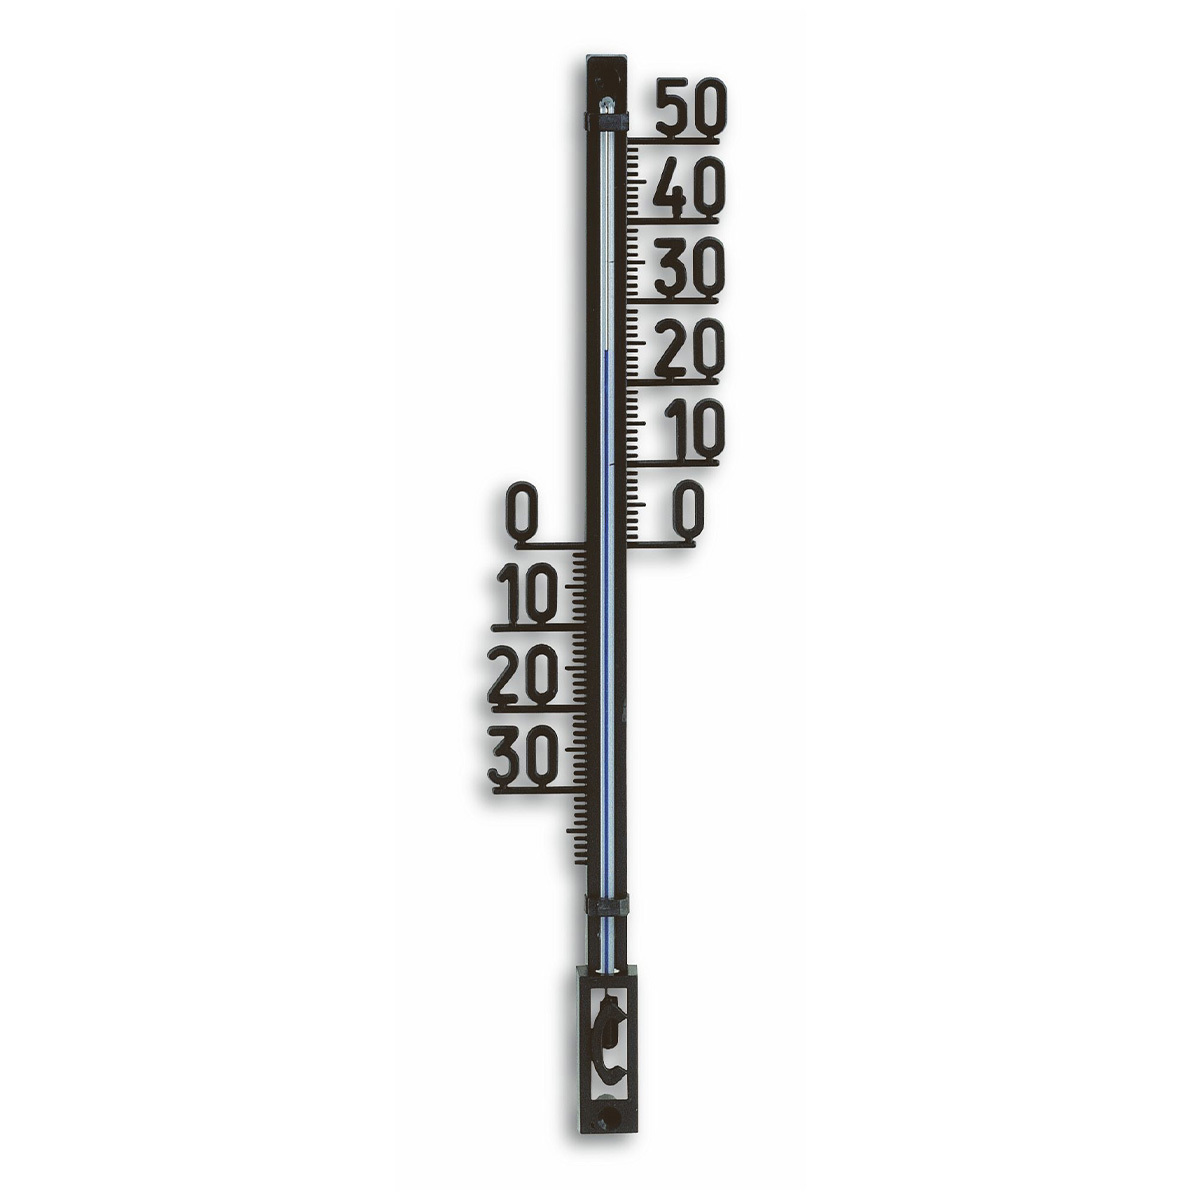 12-6003-01-90-analoges-aussenthermometer-1200x1200px.jpg